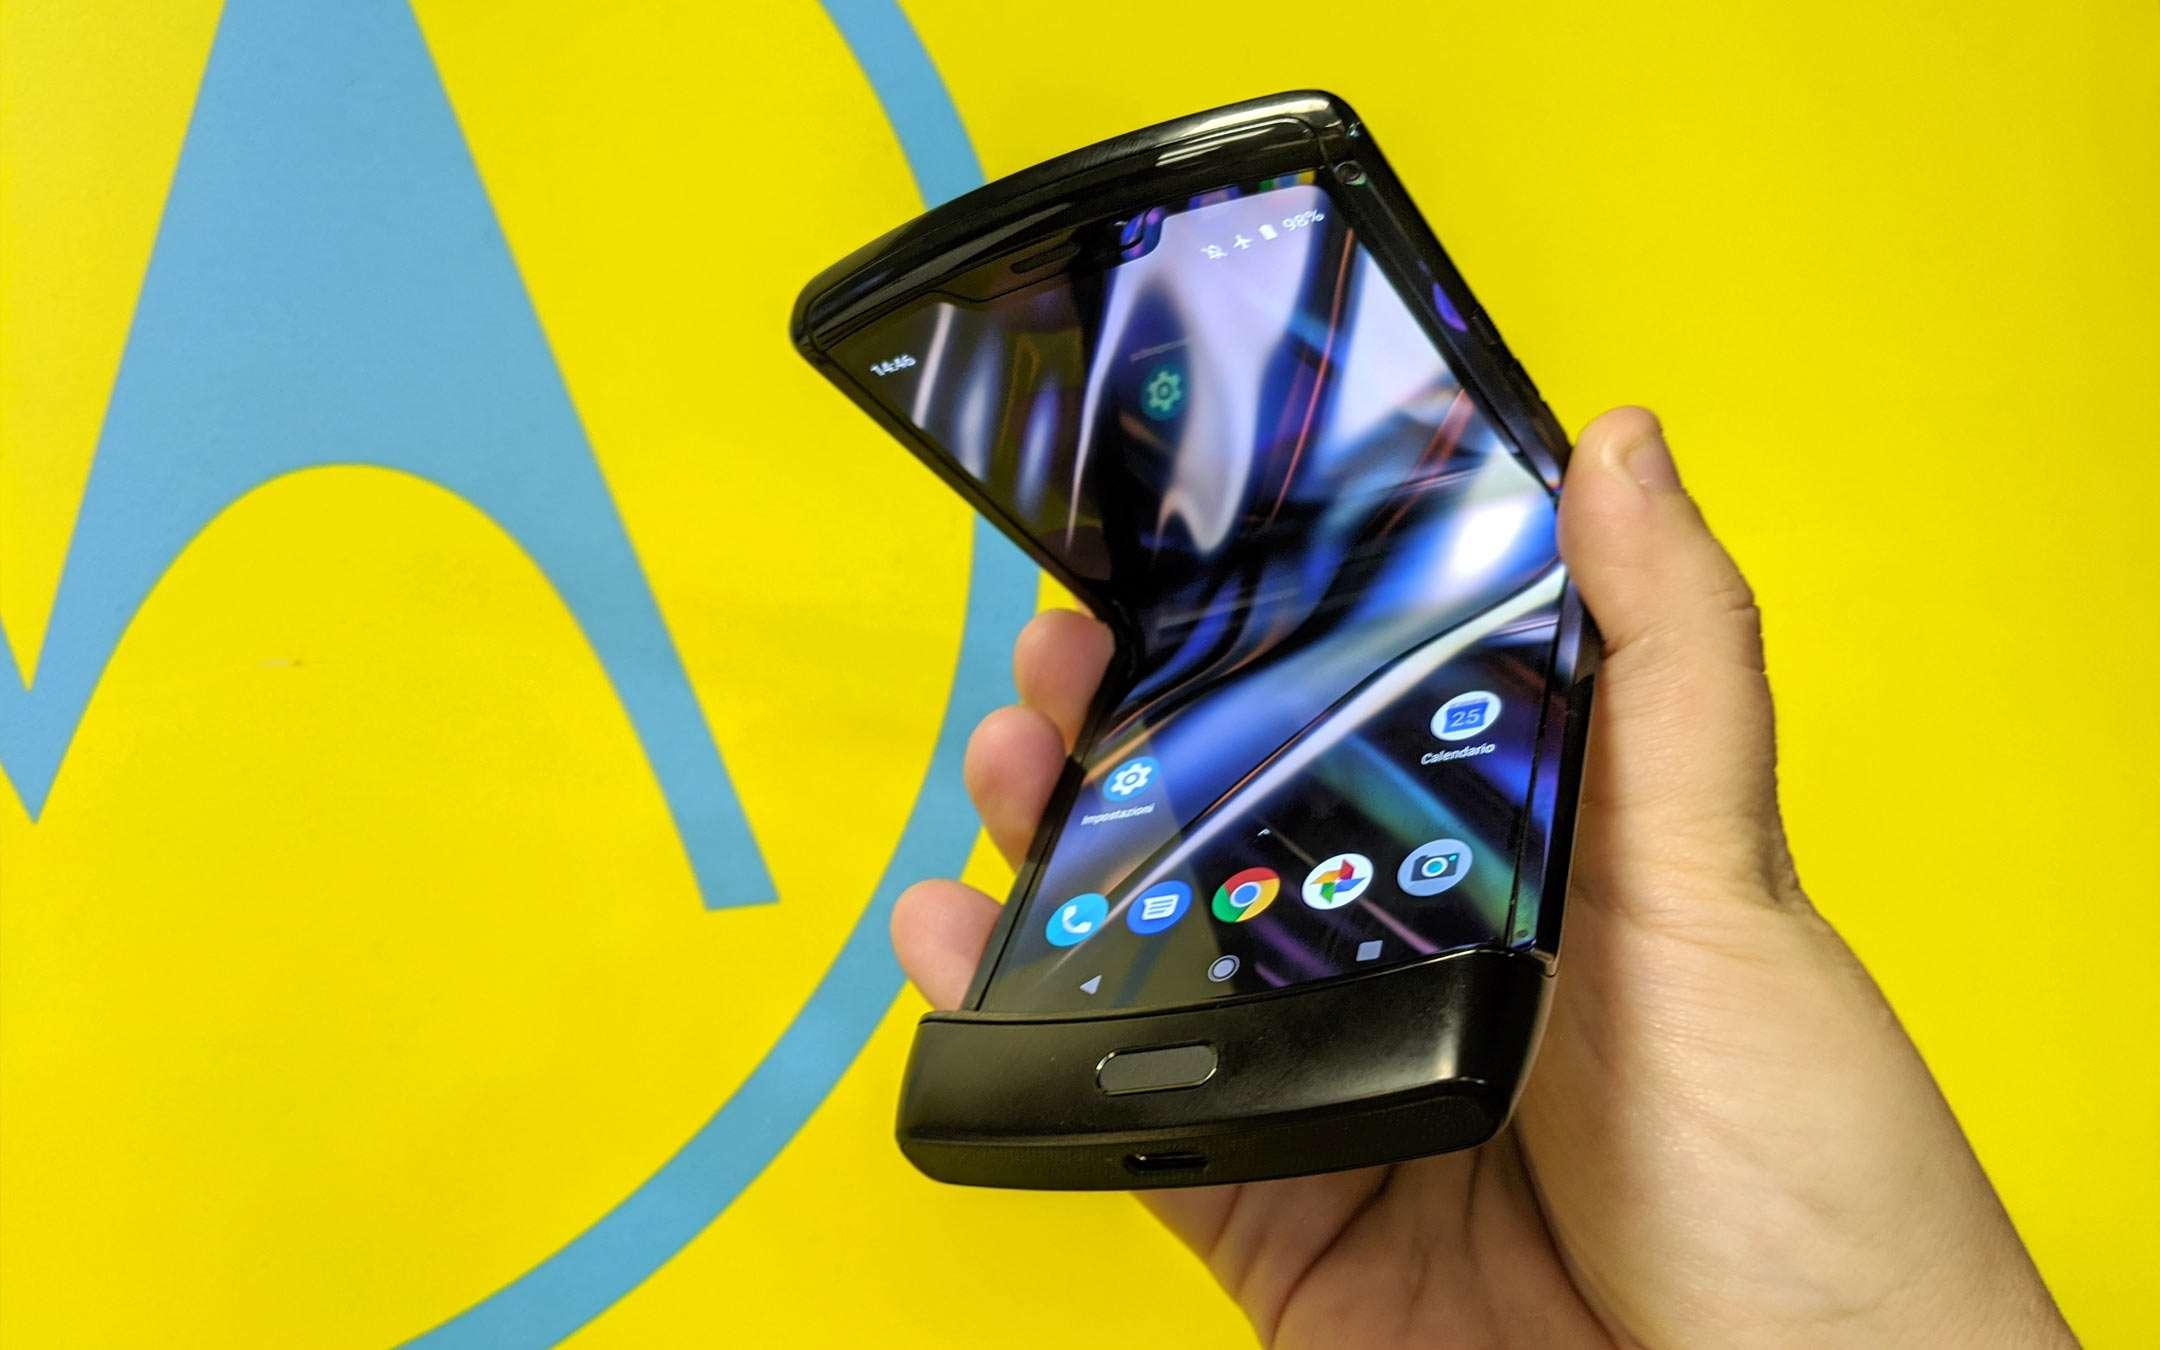 Motorola razr 2020: ci saranno novità, ma poche